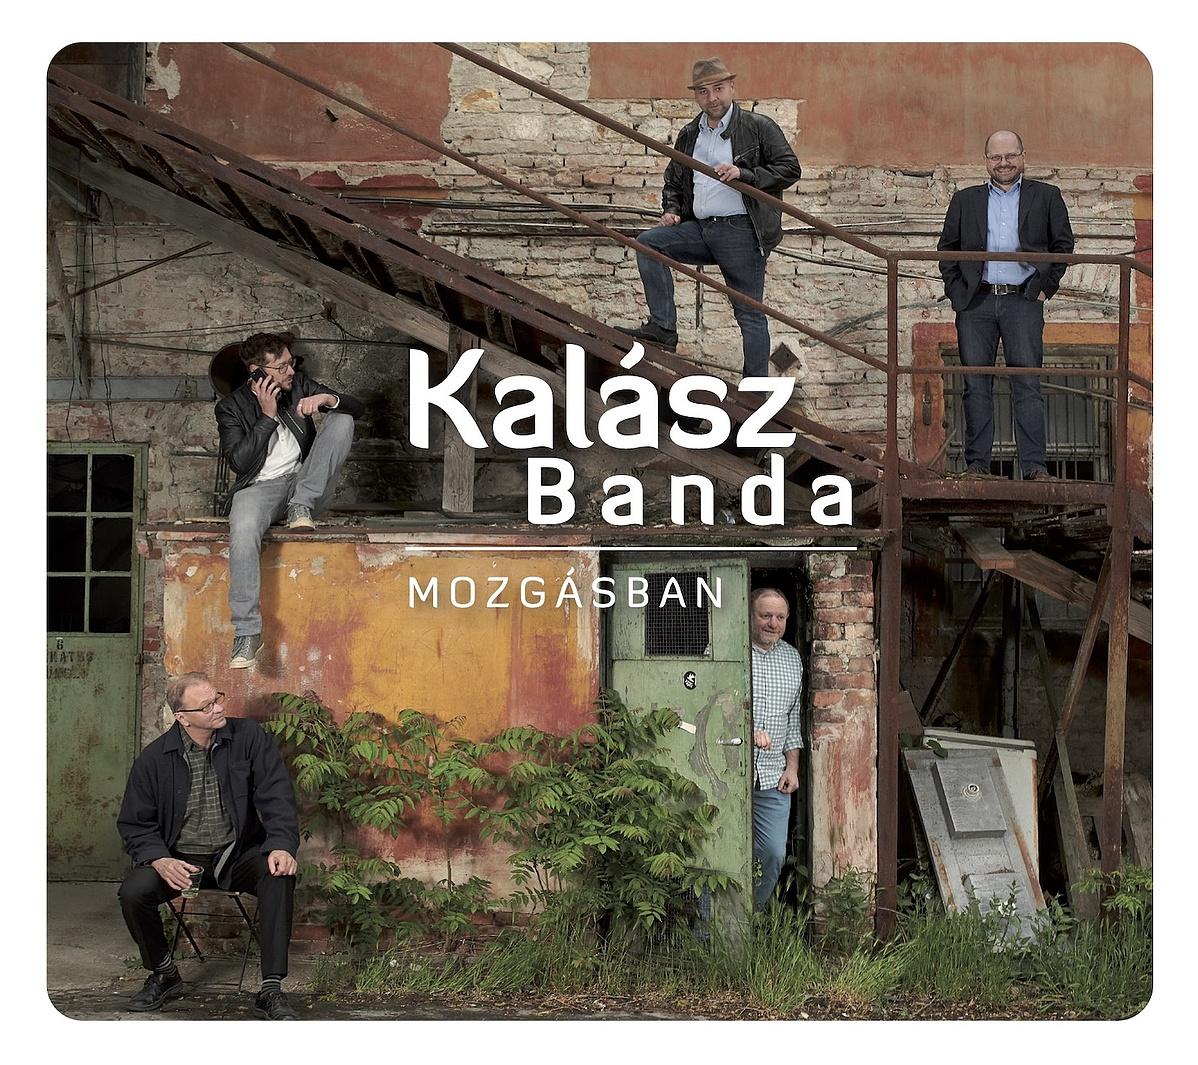 kalasz2_cover-155551.jpg